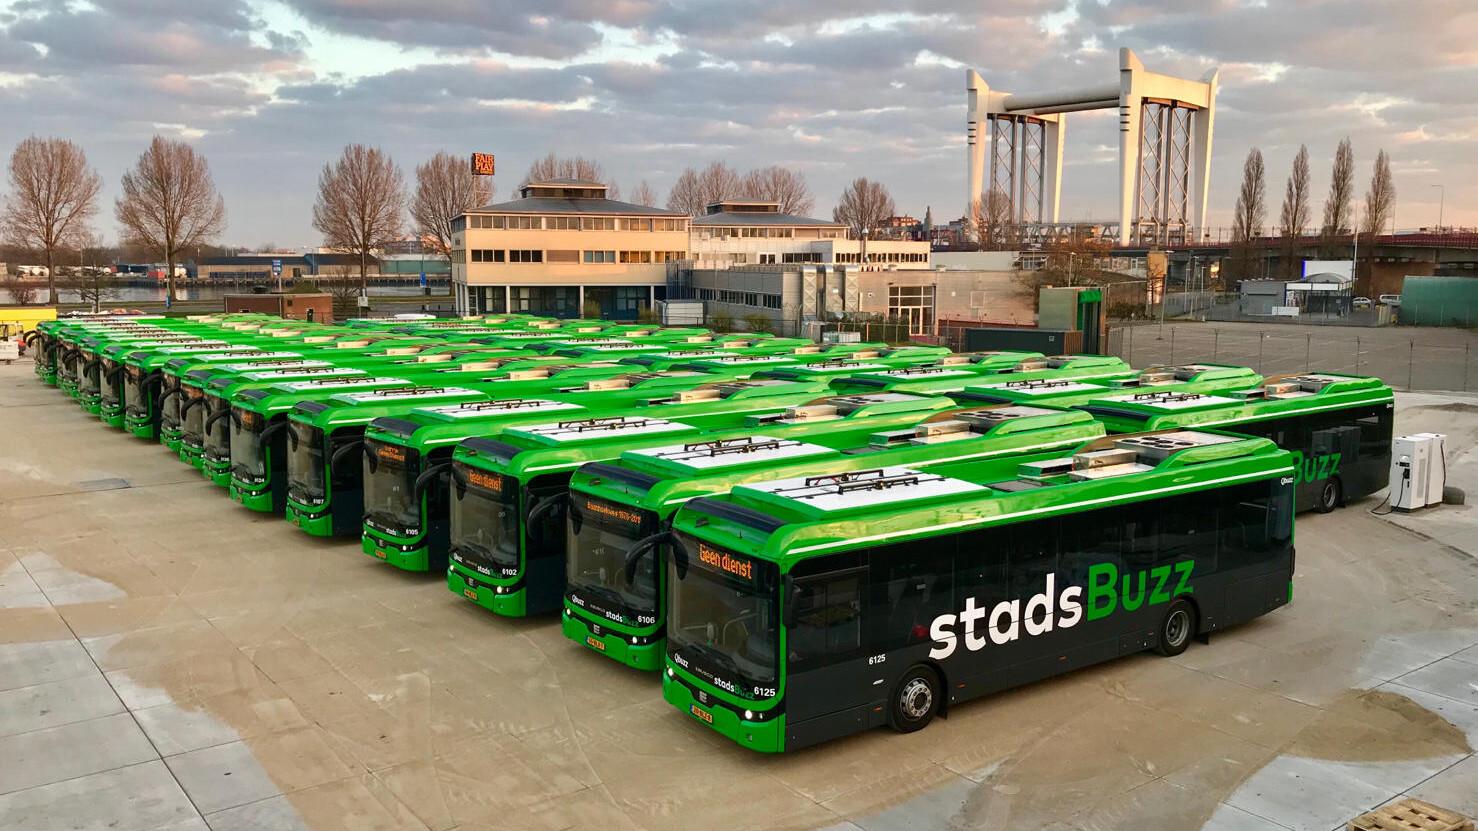 Qbuzz - DMG l Vervoer - bussen l MondoMarketing l Performance Driven Digital Marketing Bureau